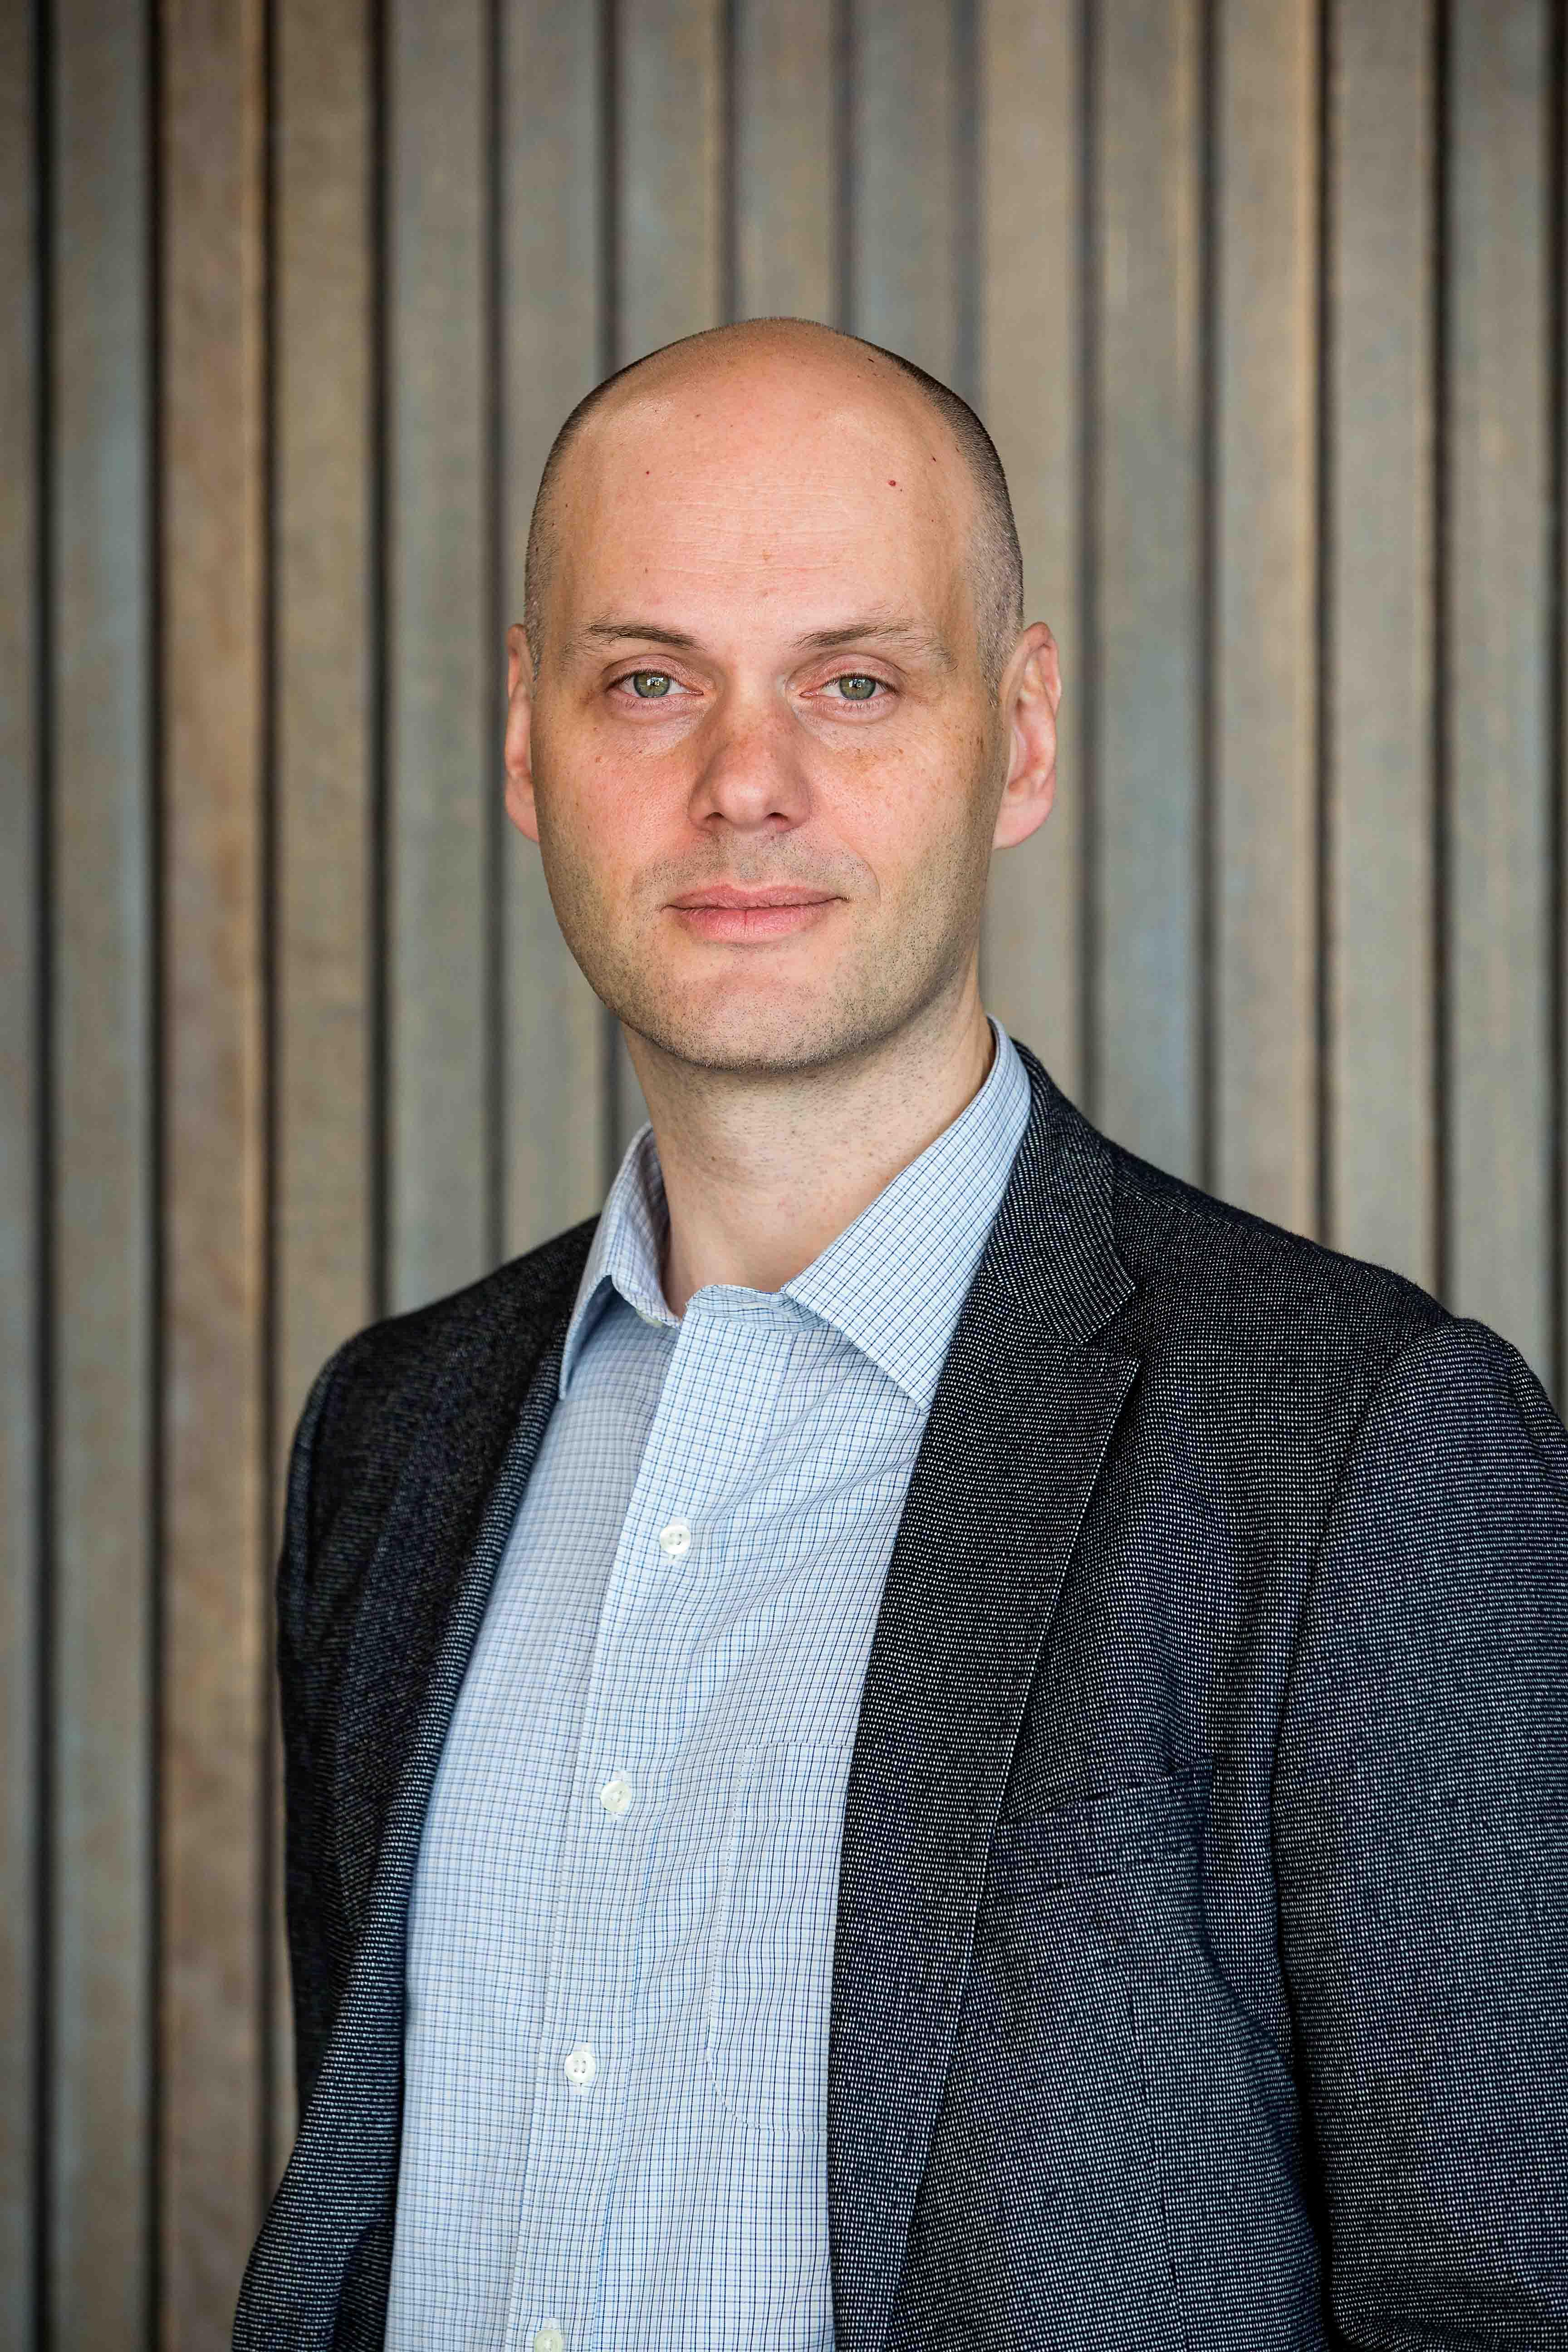 Stefan  Meisiek